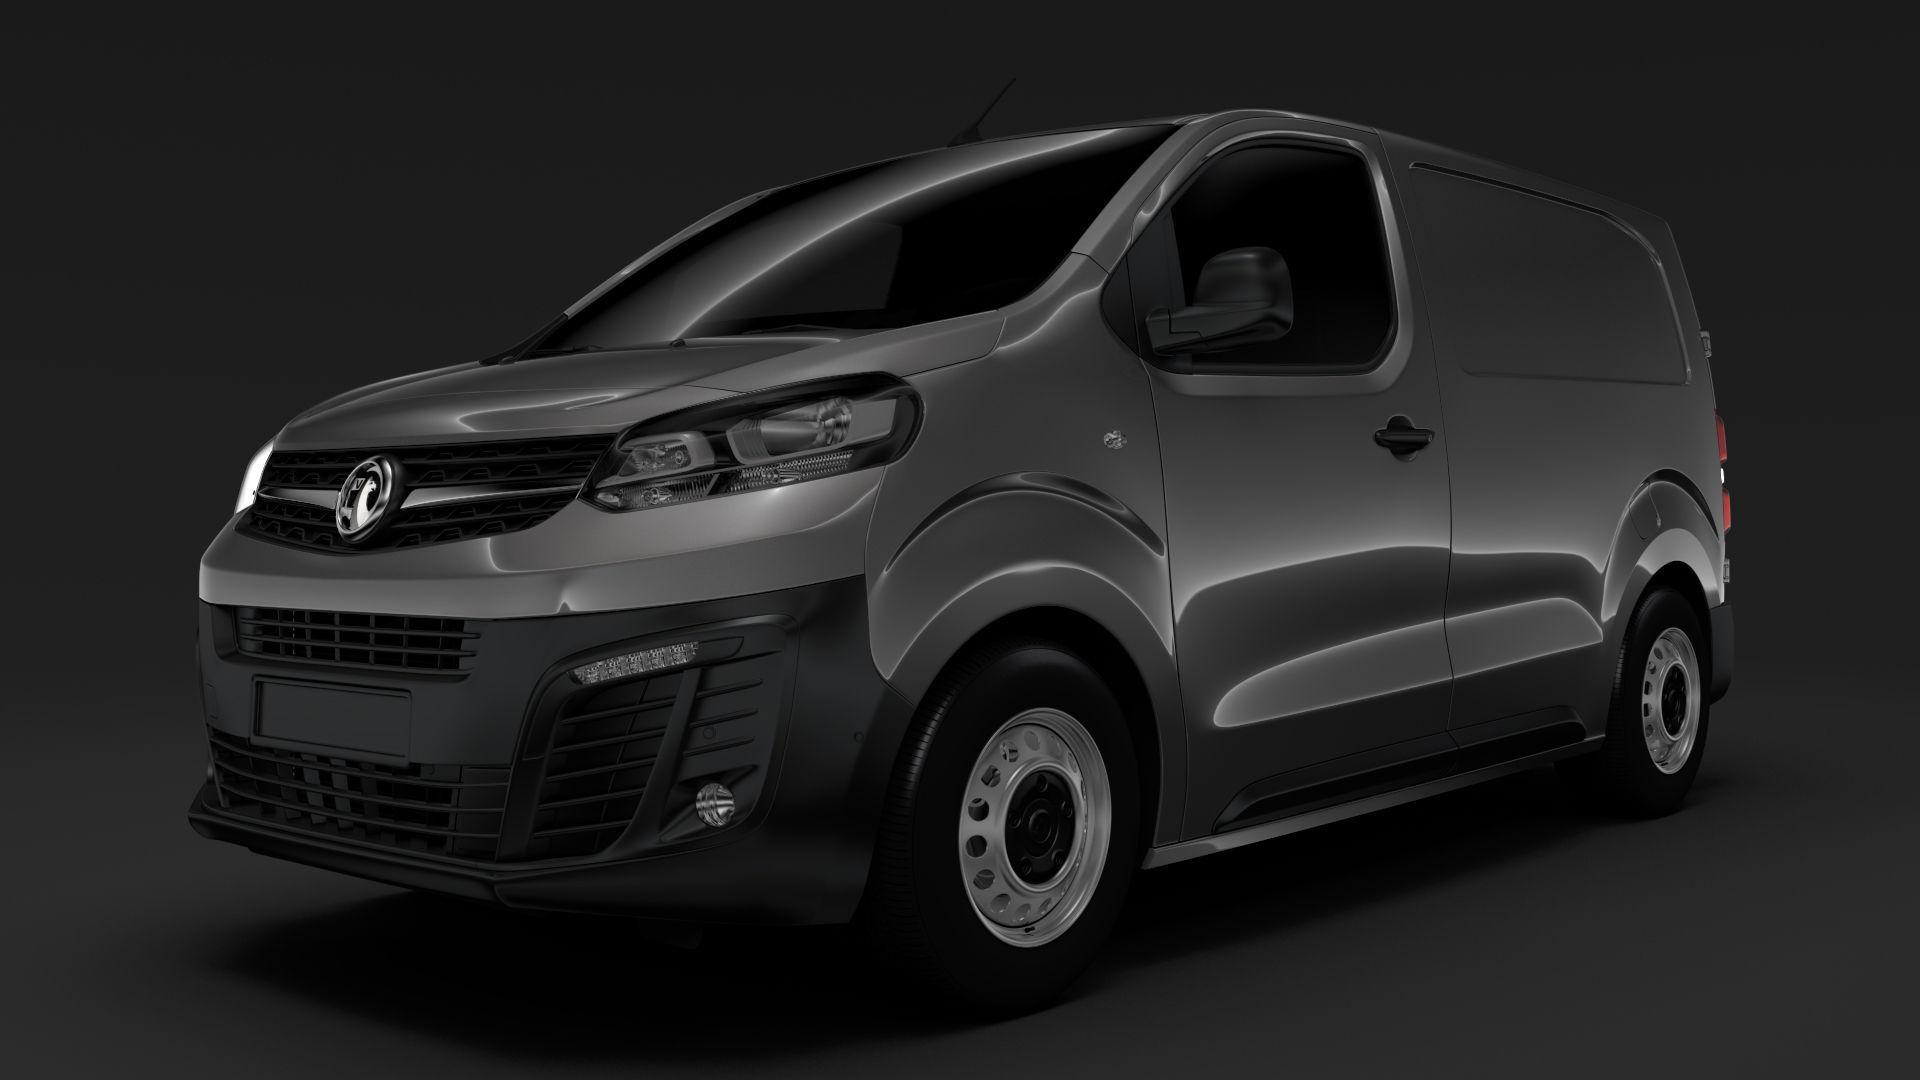 Vauxhall Vivaro L1 2020 3d Cgtrader